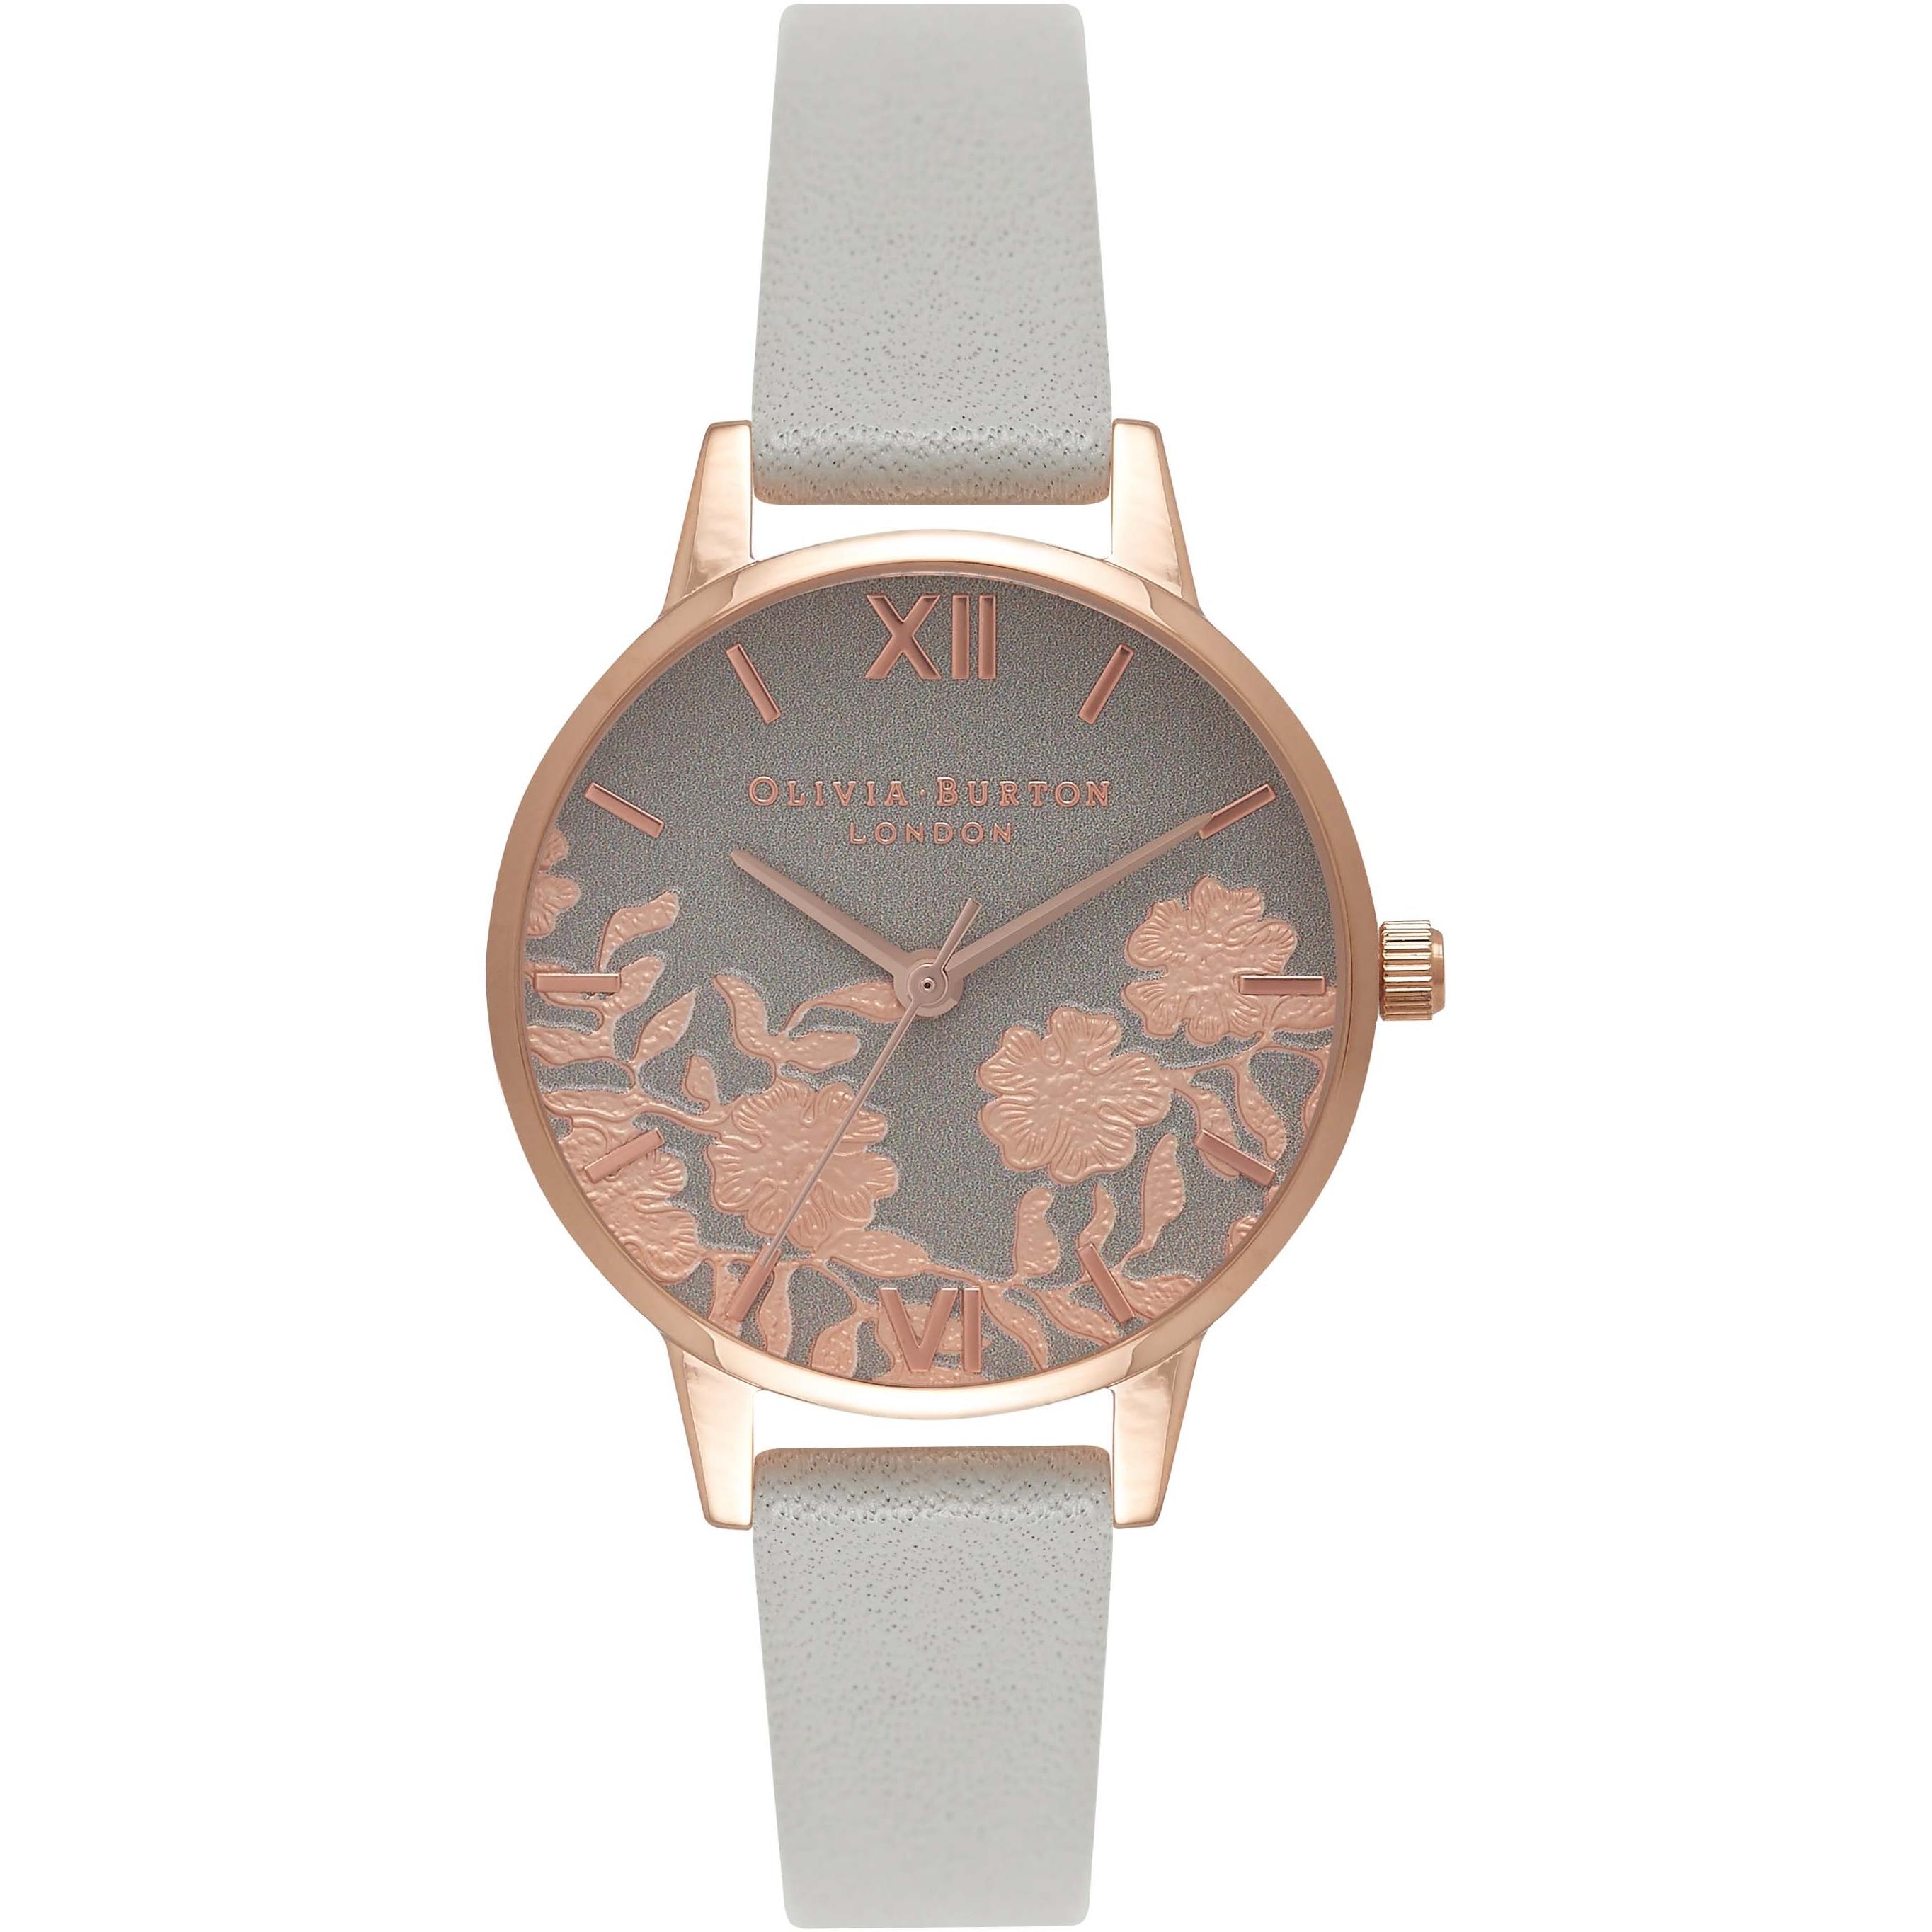 760d931805bda Ladies Olivia Burton Midi Grey Lace Detail Watch (OB16MV58 ...